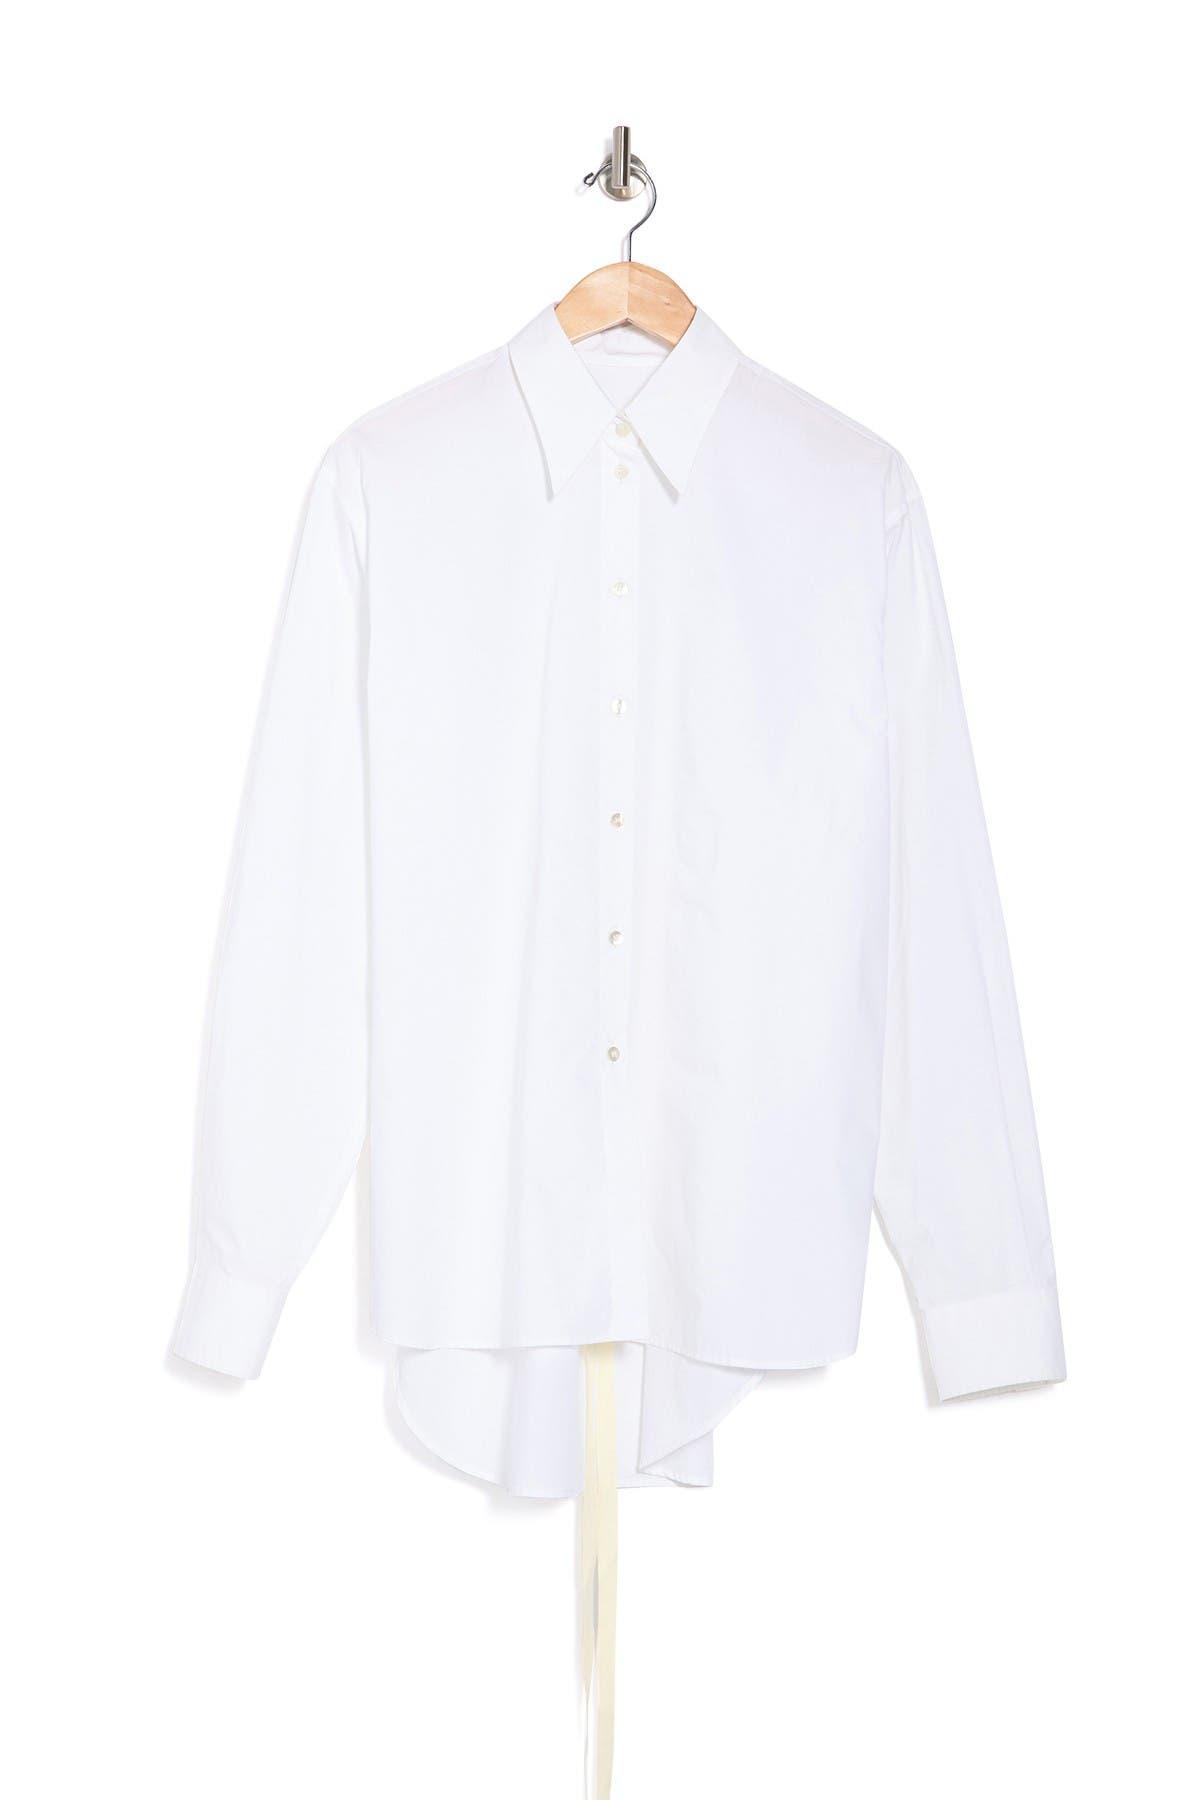 Image of MAISON MARTIN MARGIELA Tie Waist Shirt